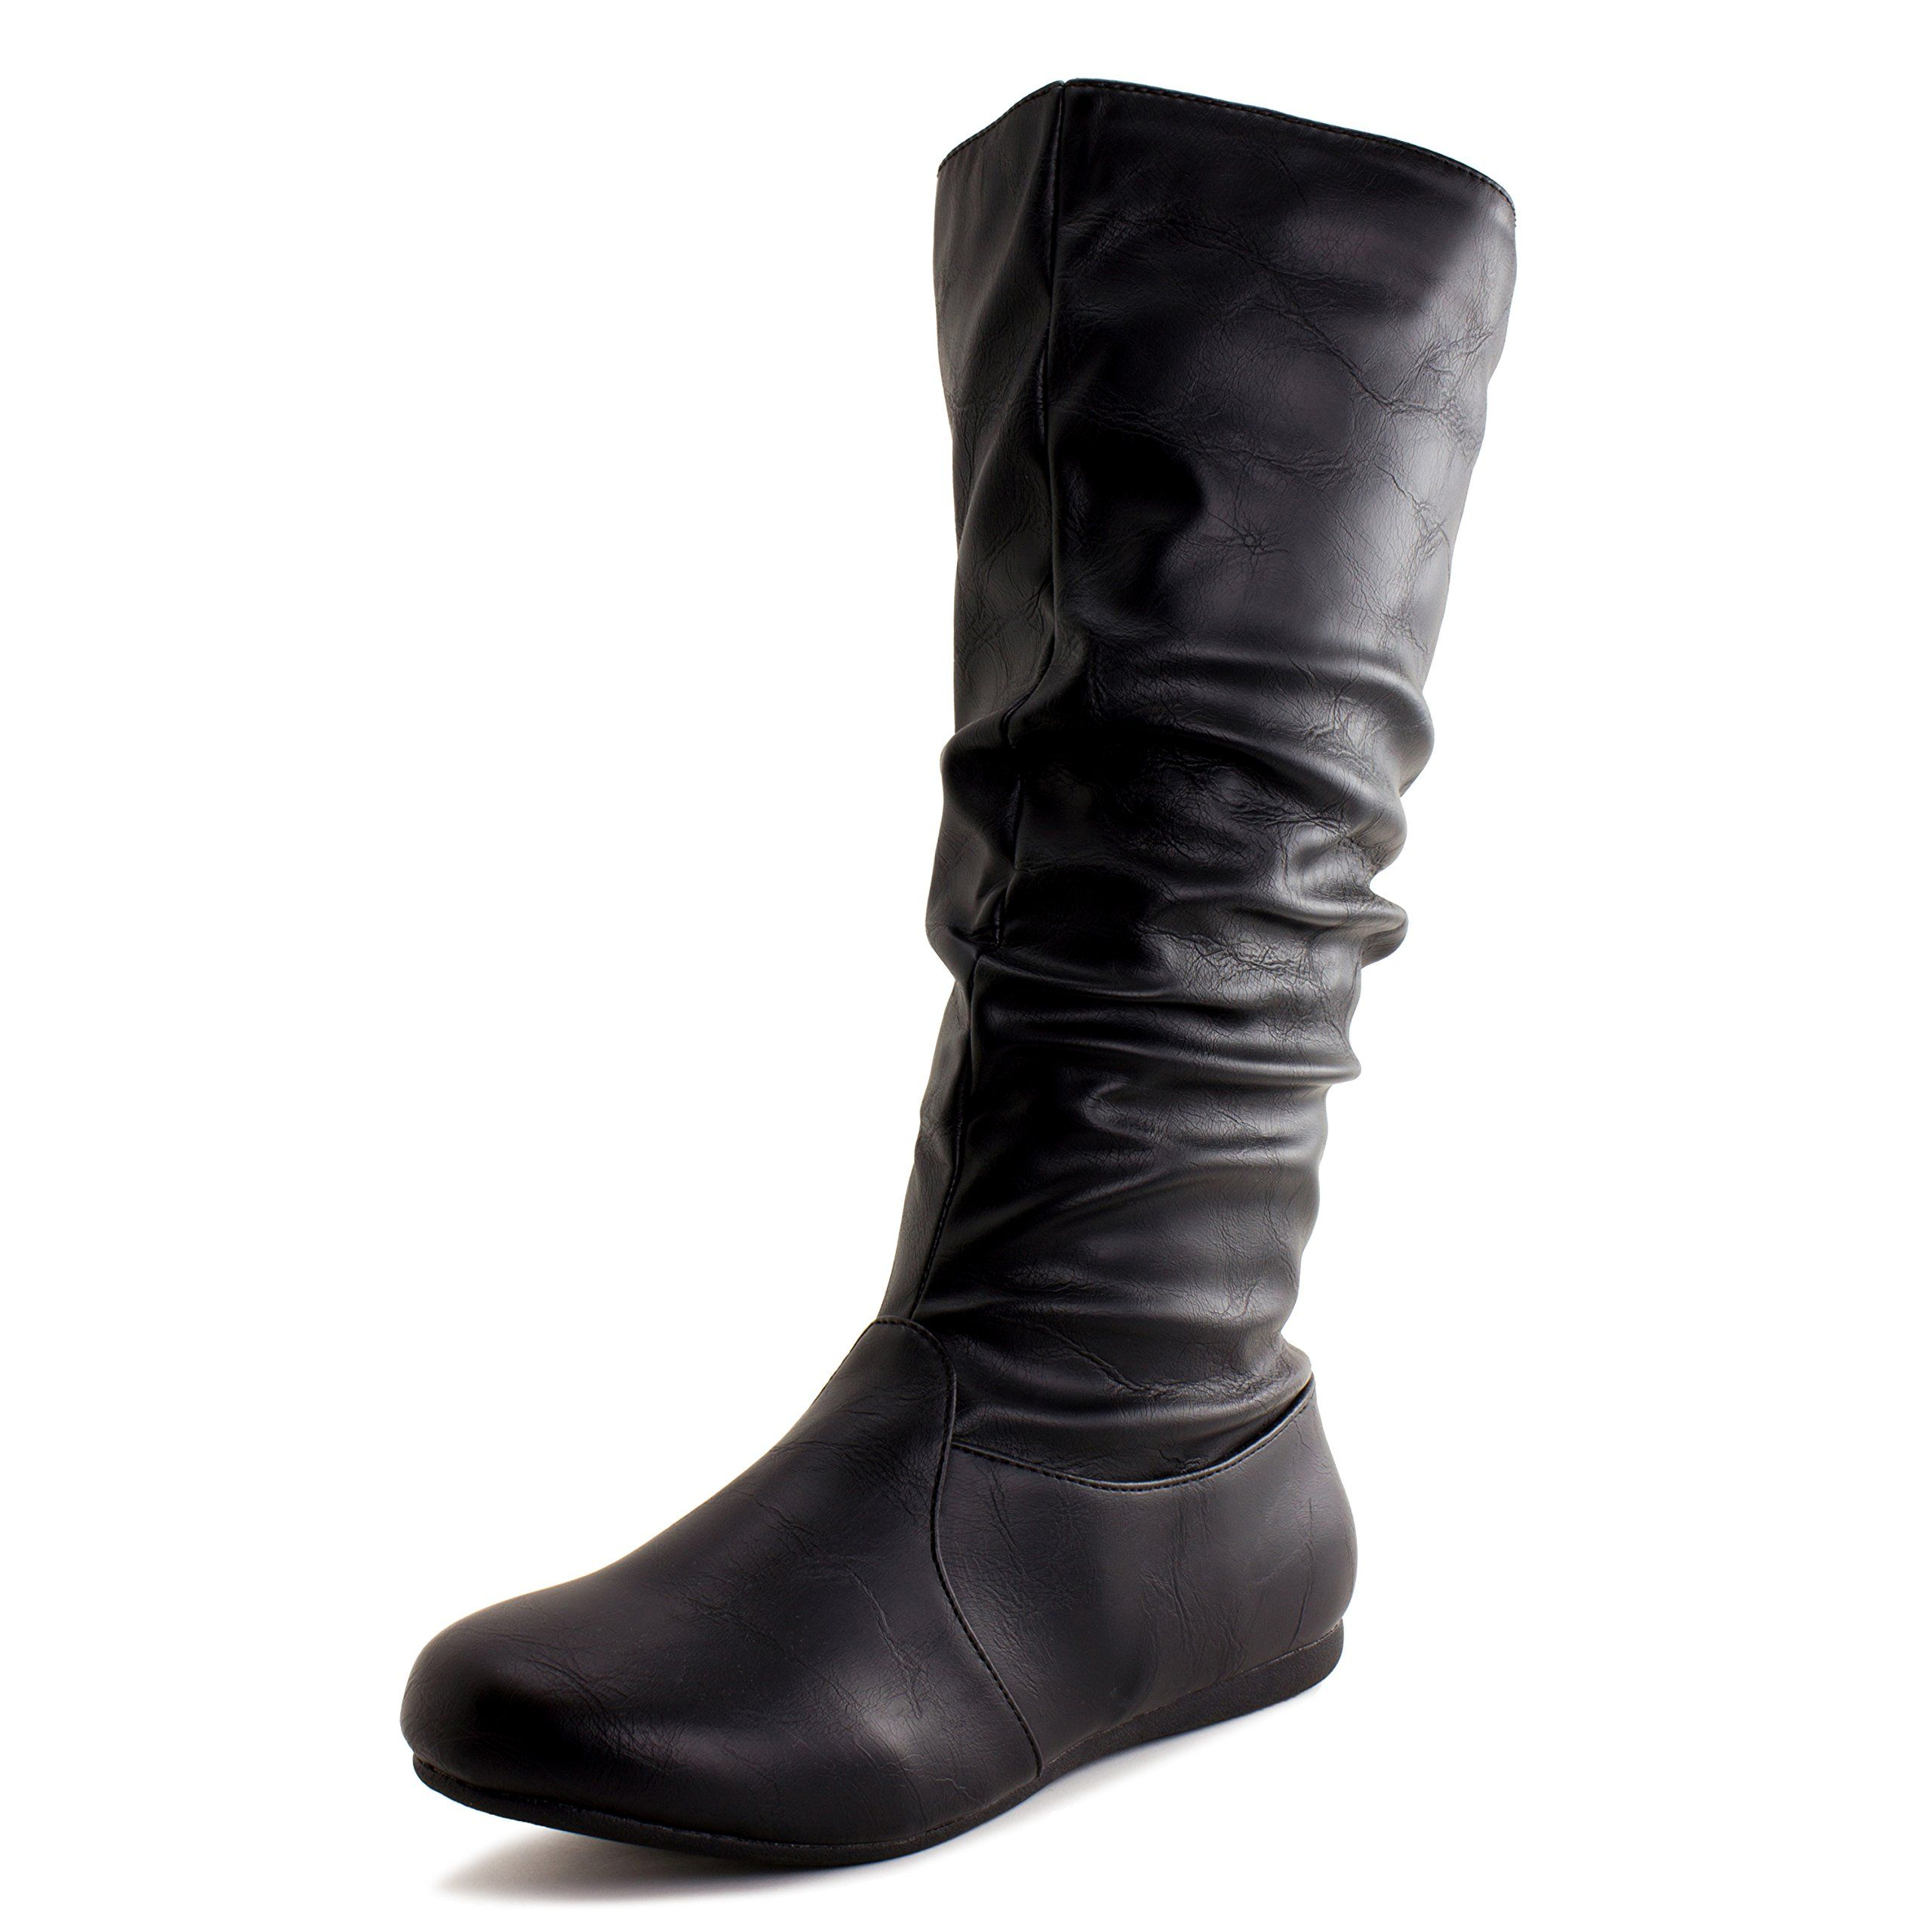 b3490f5597601 Generation19 Girls Side Zipper Faux Leather Boots, Black, 11 M US ...